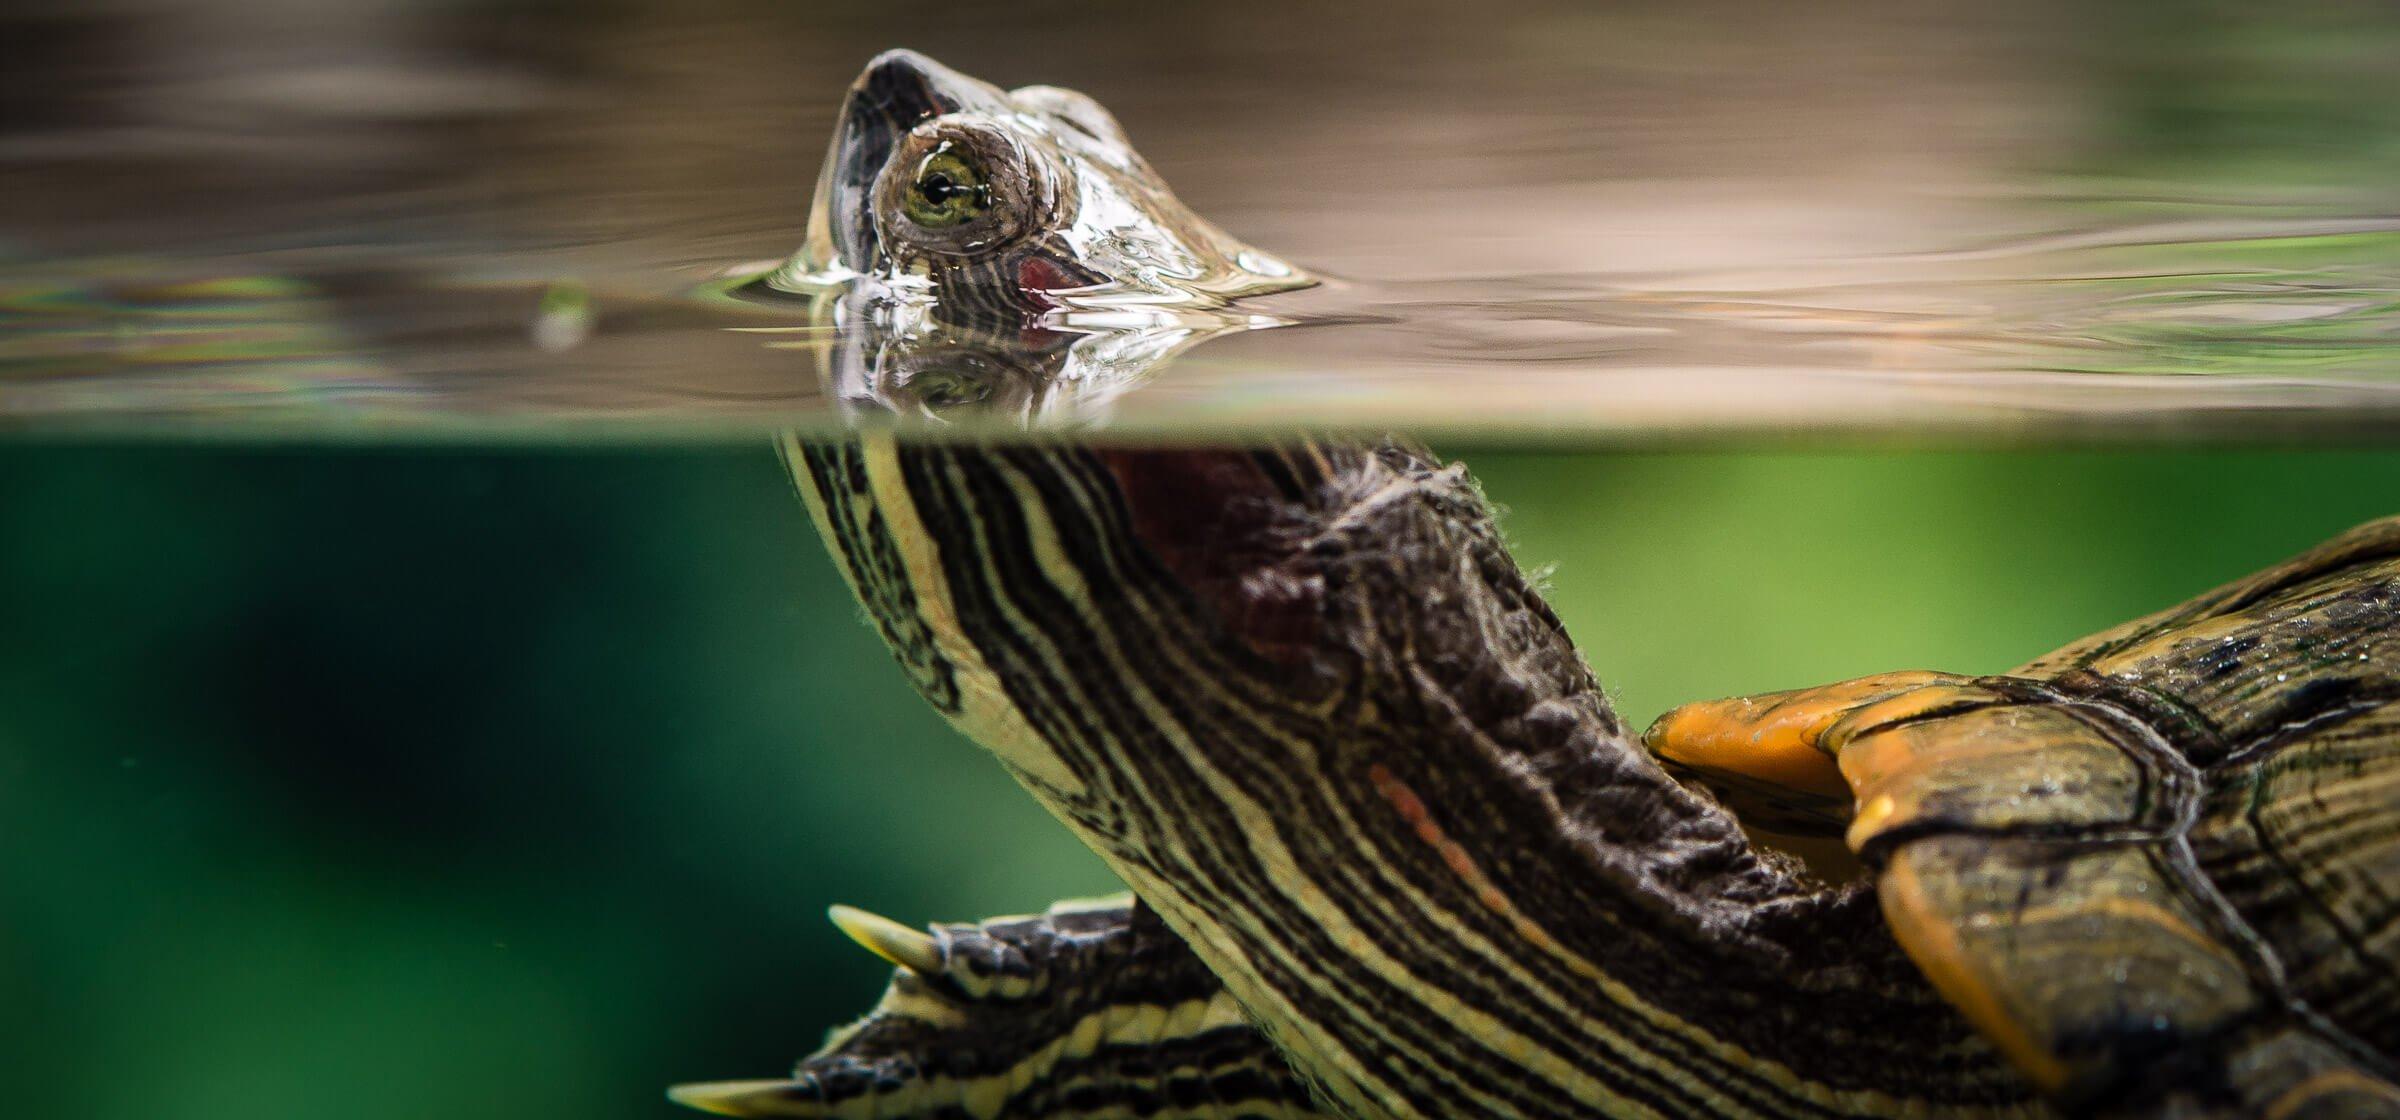 Turtle, River Safari, Singapore Zoo, Singapore